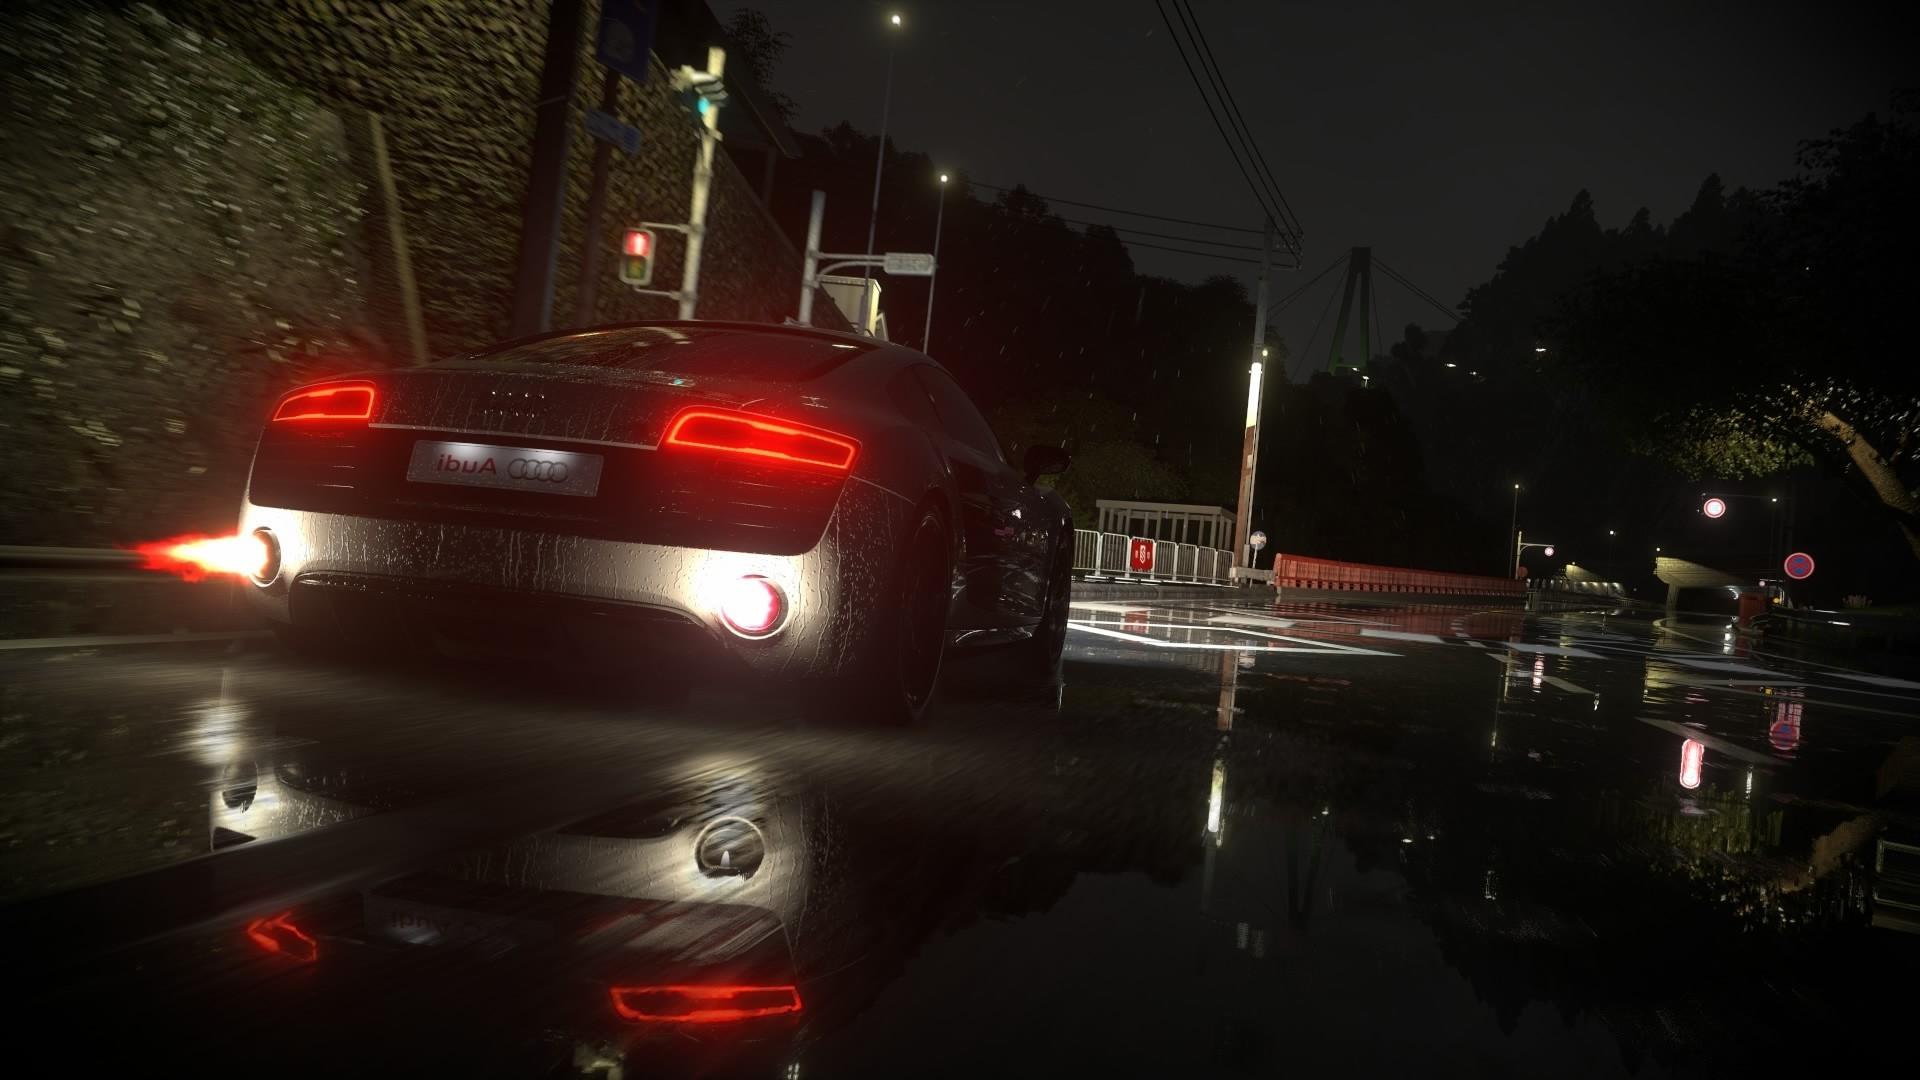 wallpaper lights video games night car vehicle rain road evening traffic v10 engine. Black Bedroom Furniture Sets. Home Design Ideas